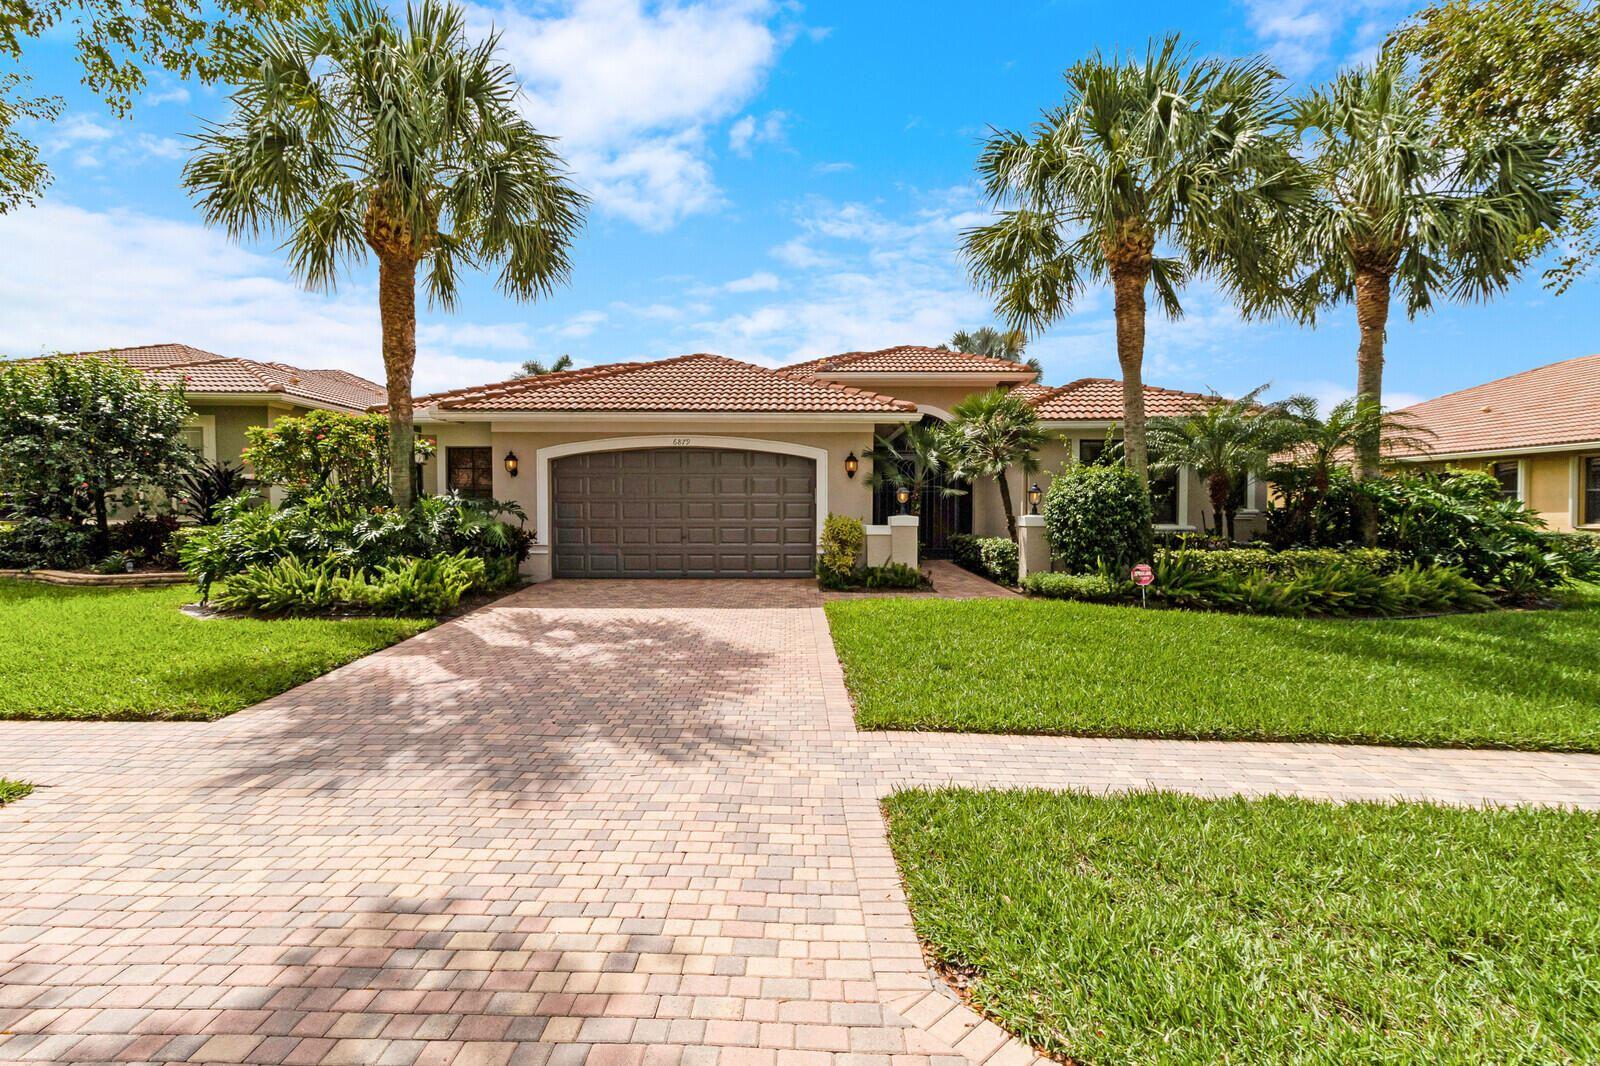 Photo of 6879 Caviro Lane Lane, Boynton Beach, FL 33437 (MLS # RX-10697051)